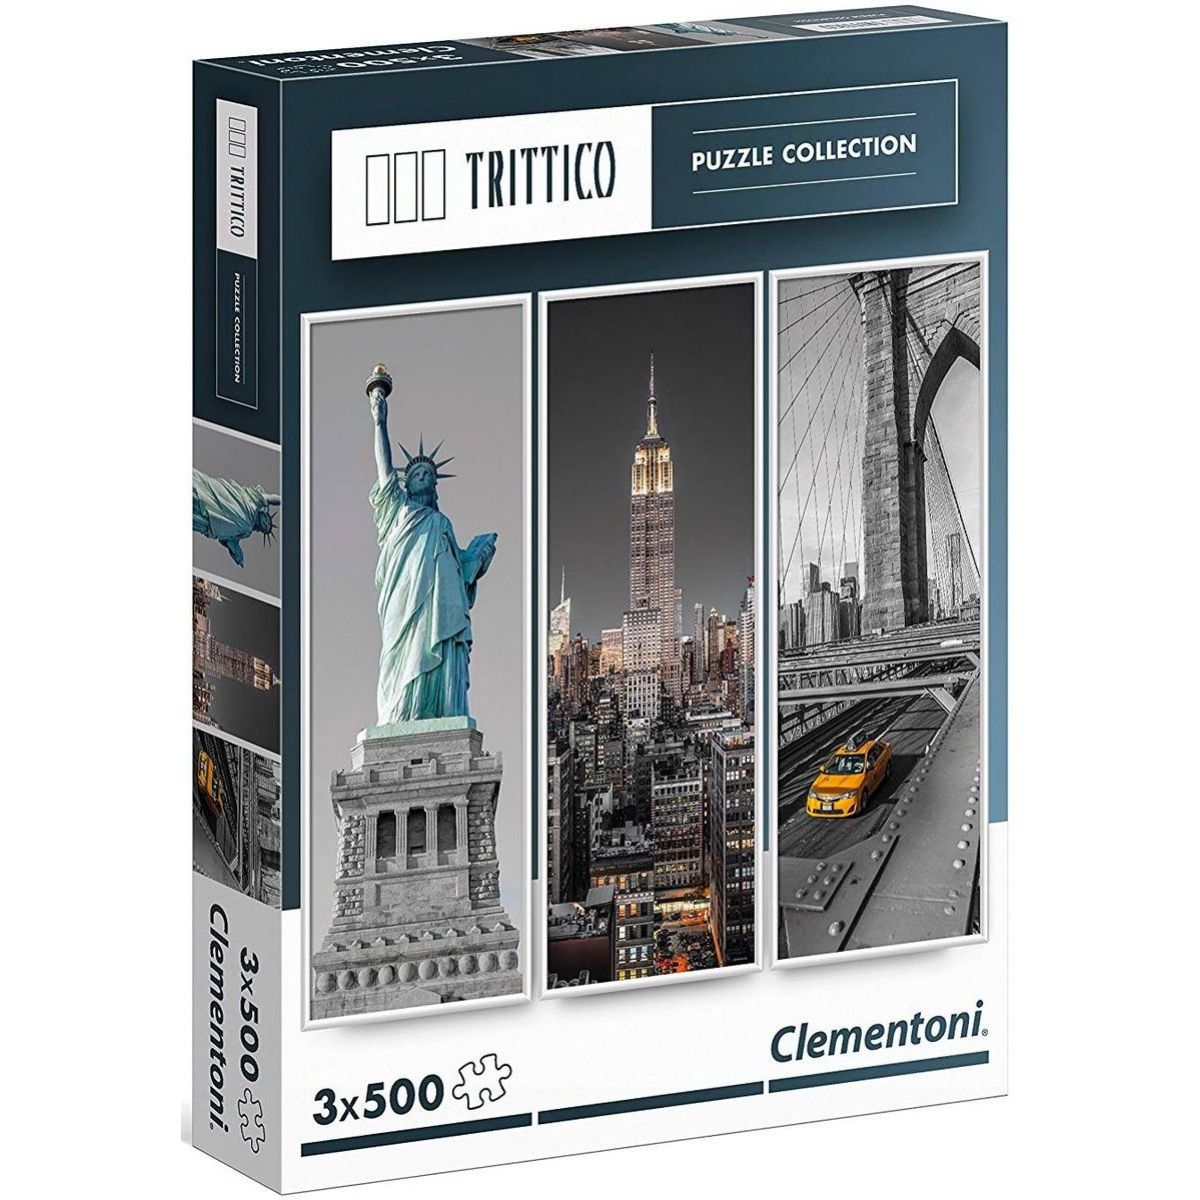 Clementoni Puzzle TRITTICO New York 3 x 500 dielikov